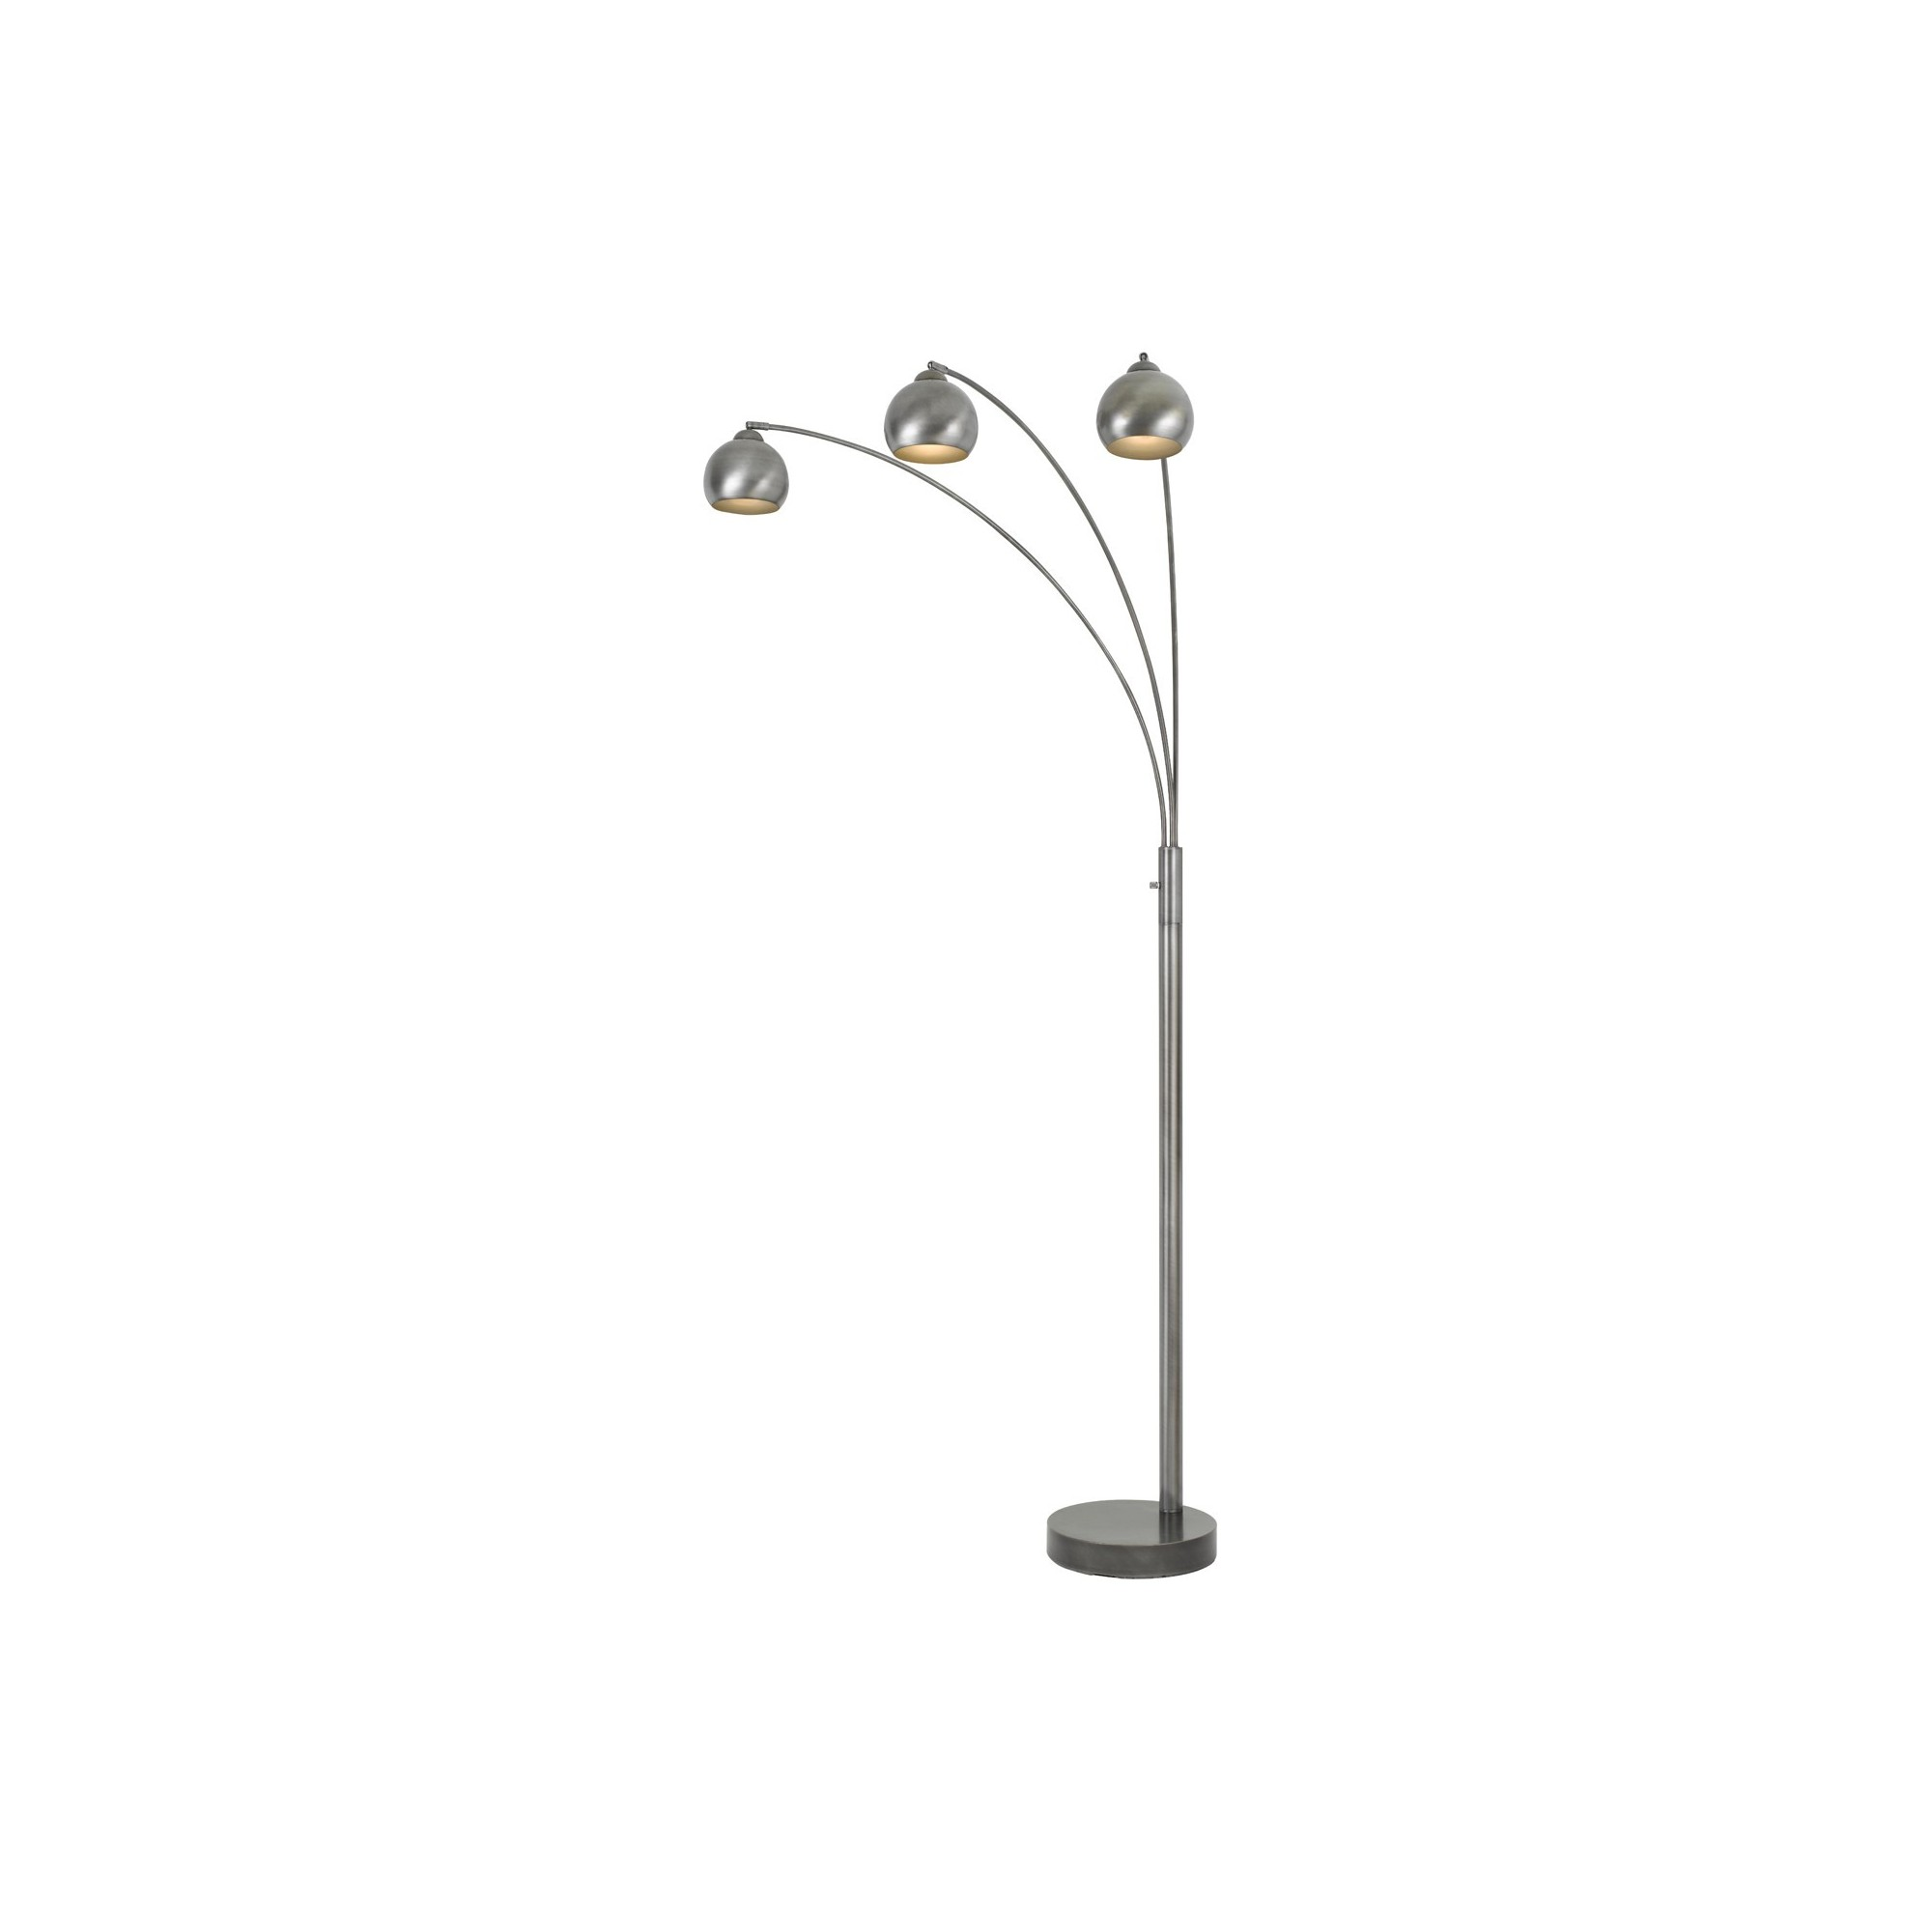 Floor lamp cal lighting floor lamps floor lamp and lights floor lamp cal lighting mozeypictures Choice Image